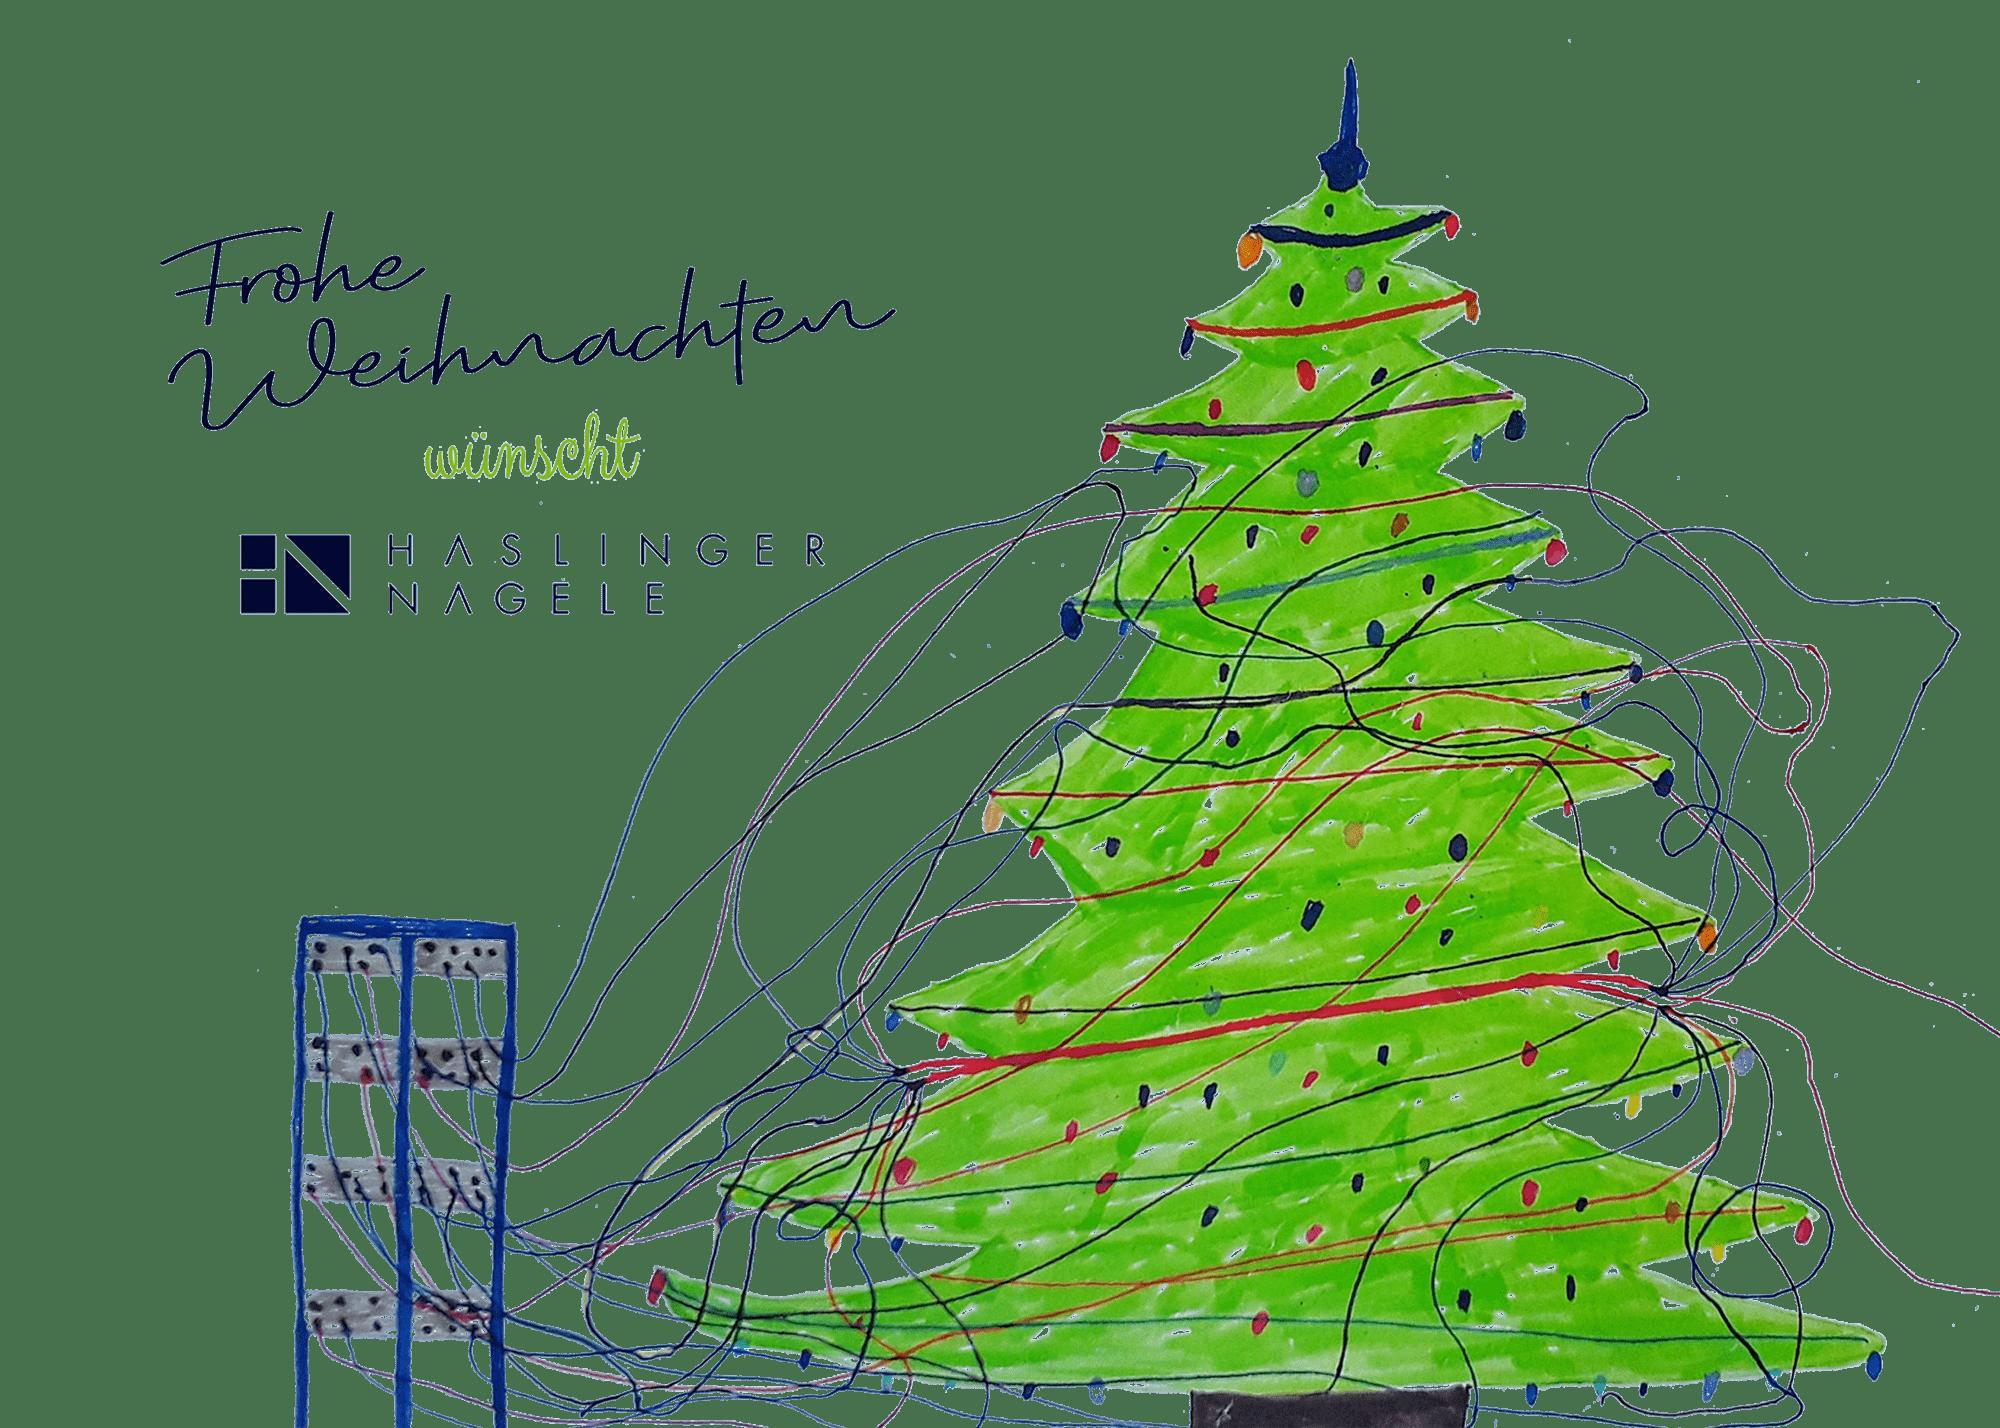 Frohe Weihnachten wünscht Haslinger / Nagele. Illustration: Barbara Plak